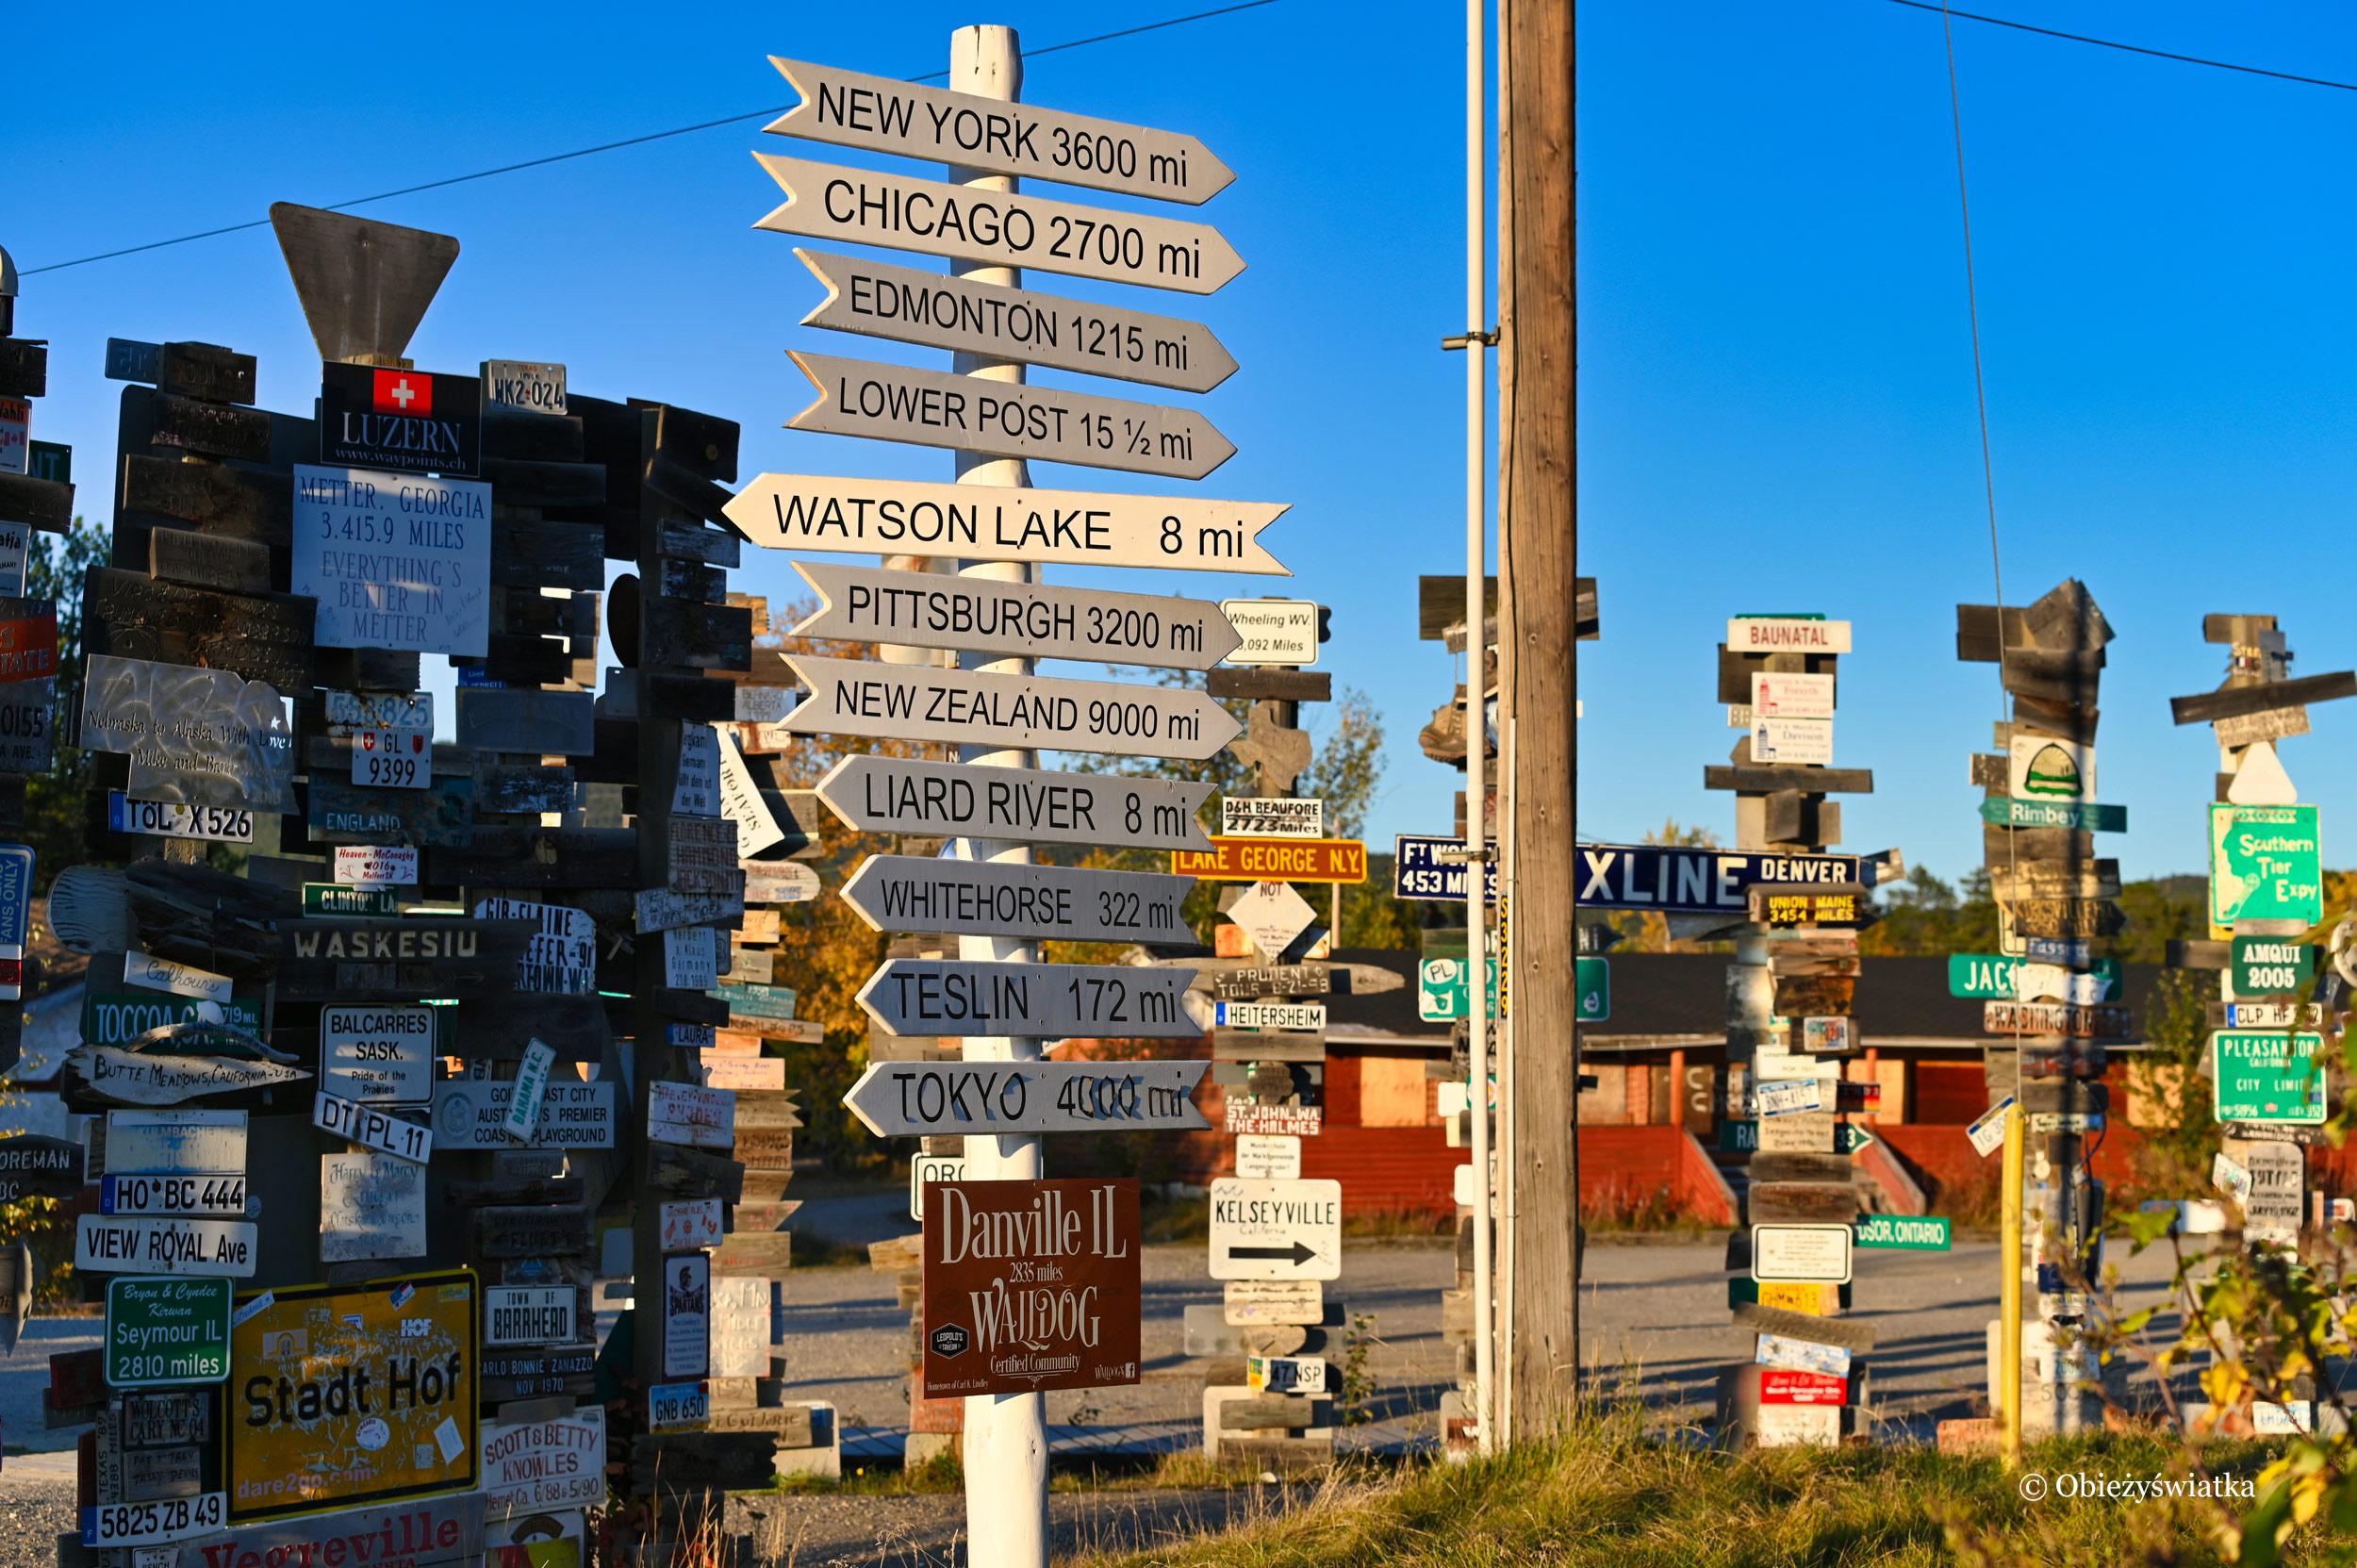 Danville, Illionois - nowy szyld miejscowości Carla Lindleya, Sign Post Forest, Watson Lake